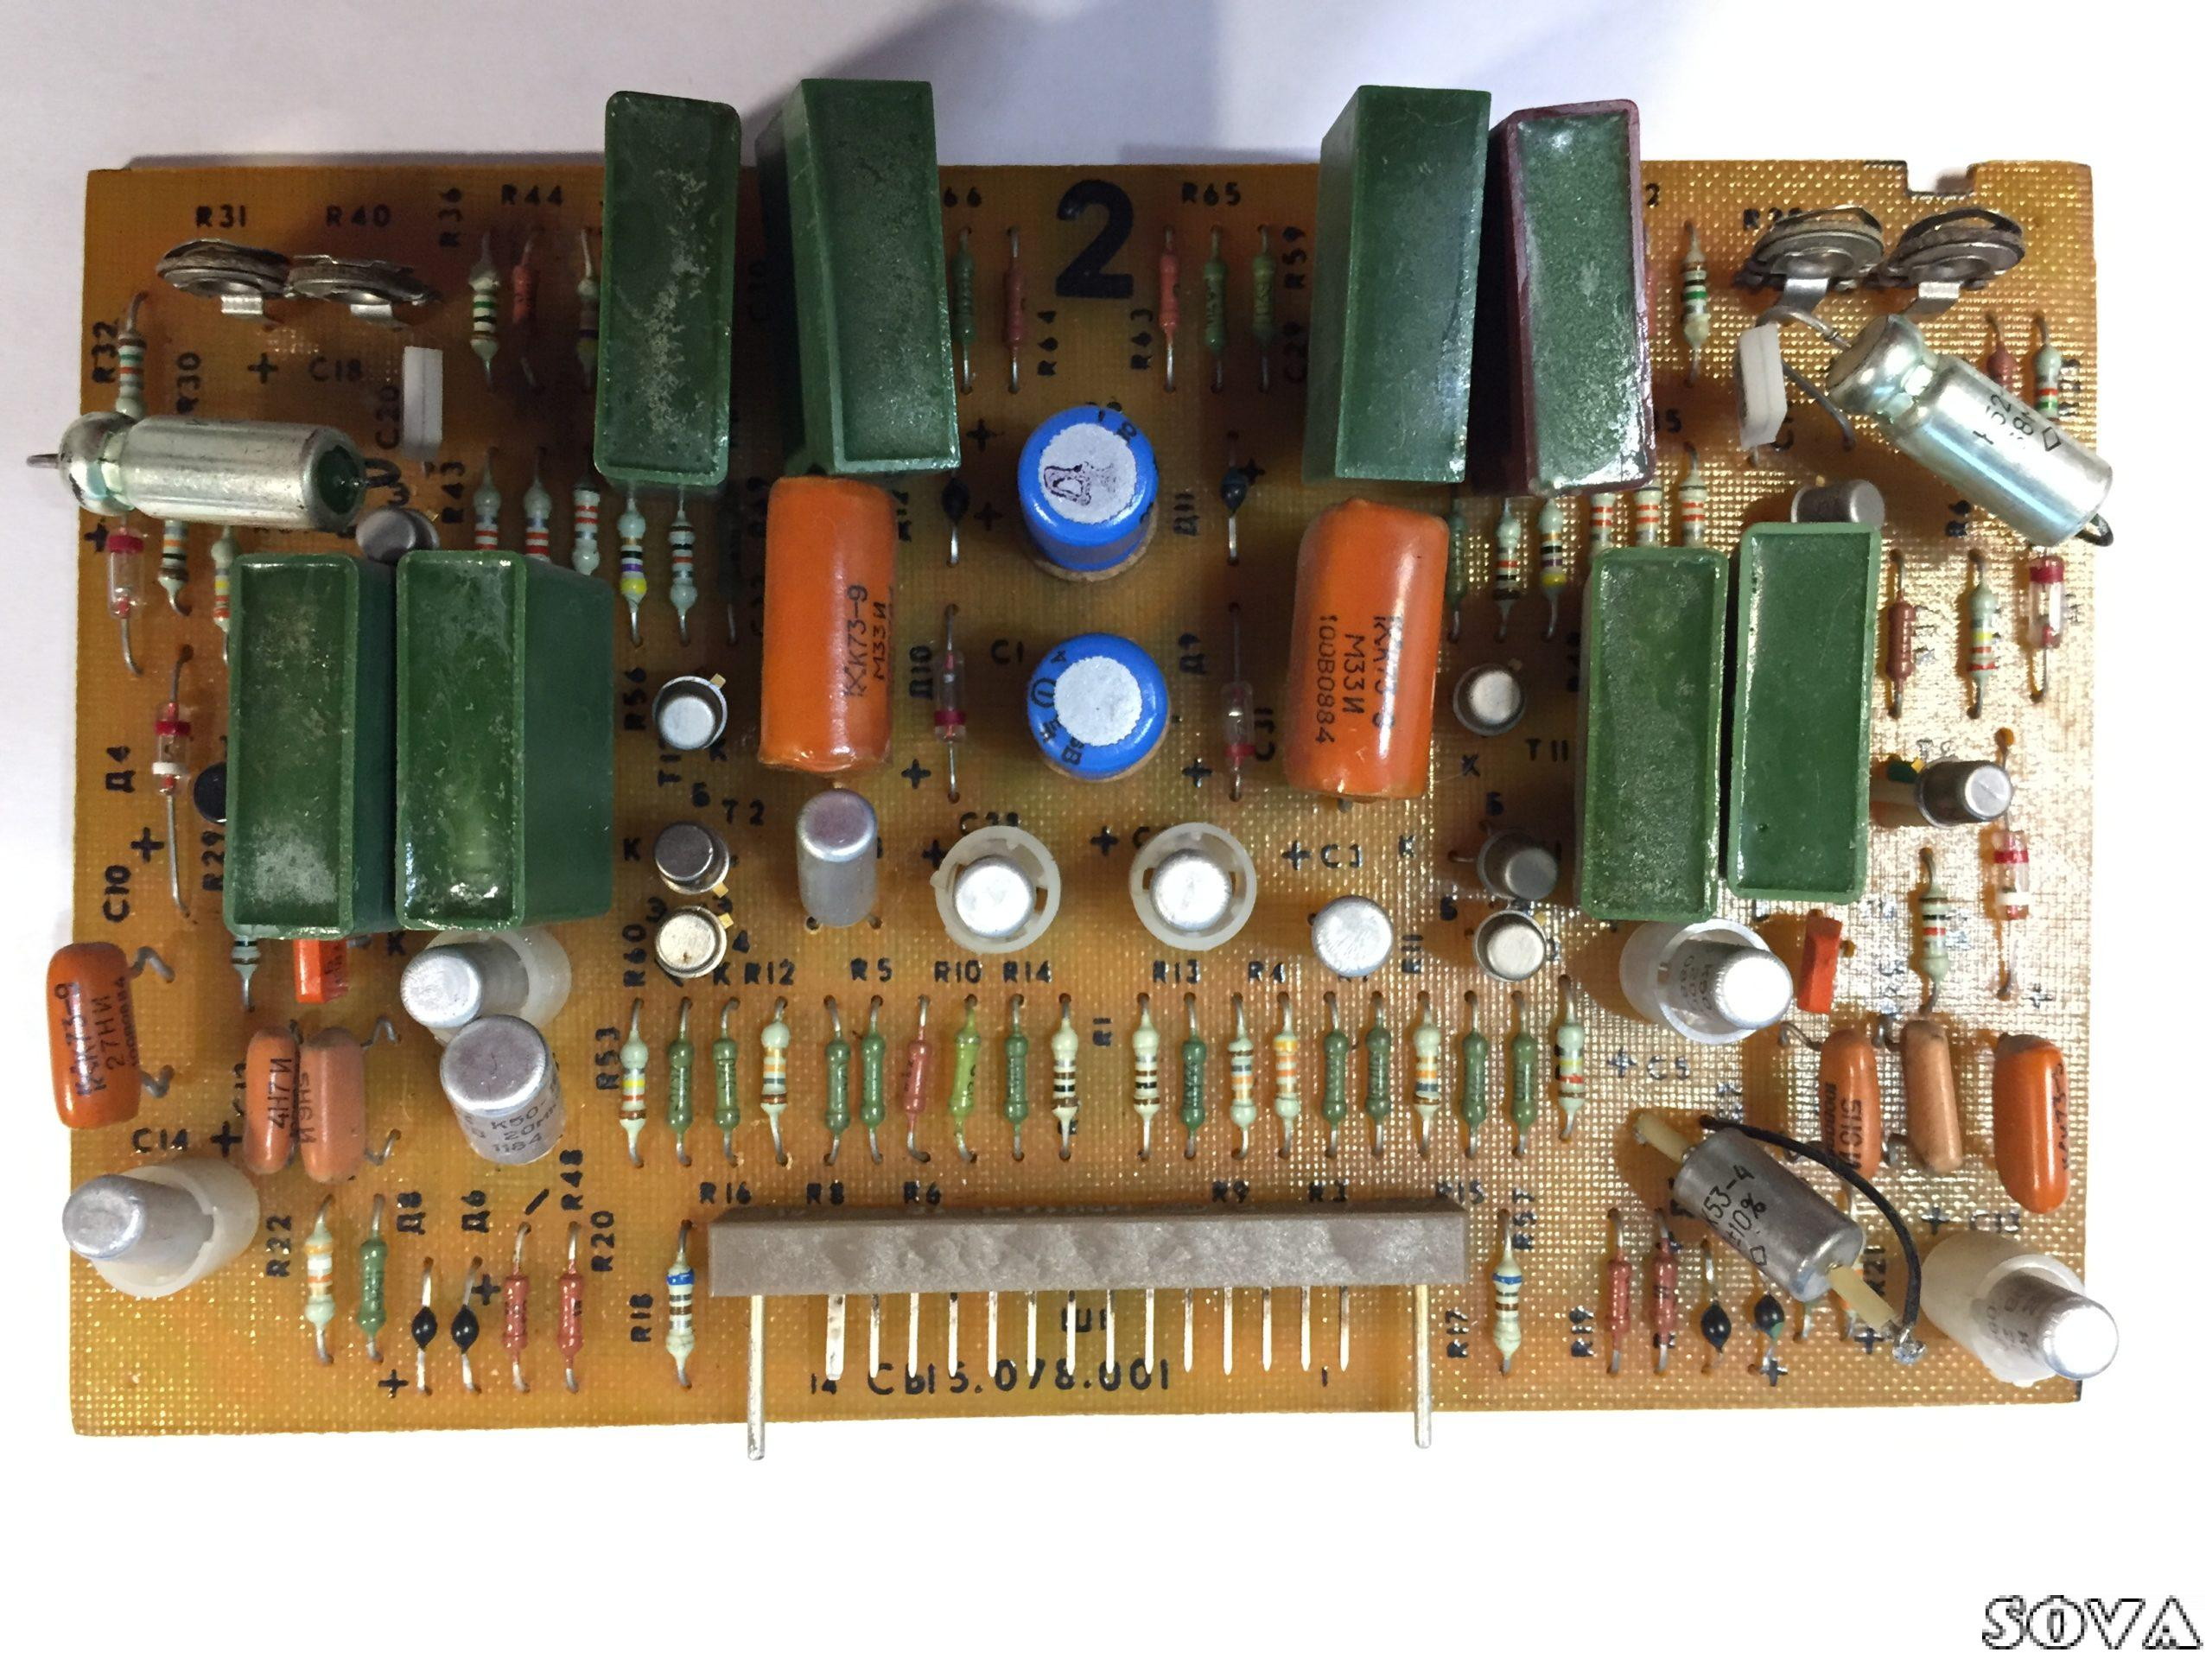 Vilma-204-Dolby-K71-1-1